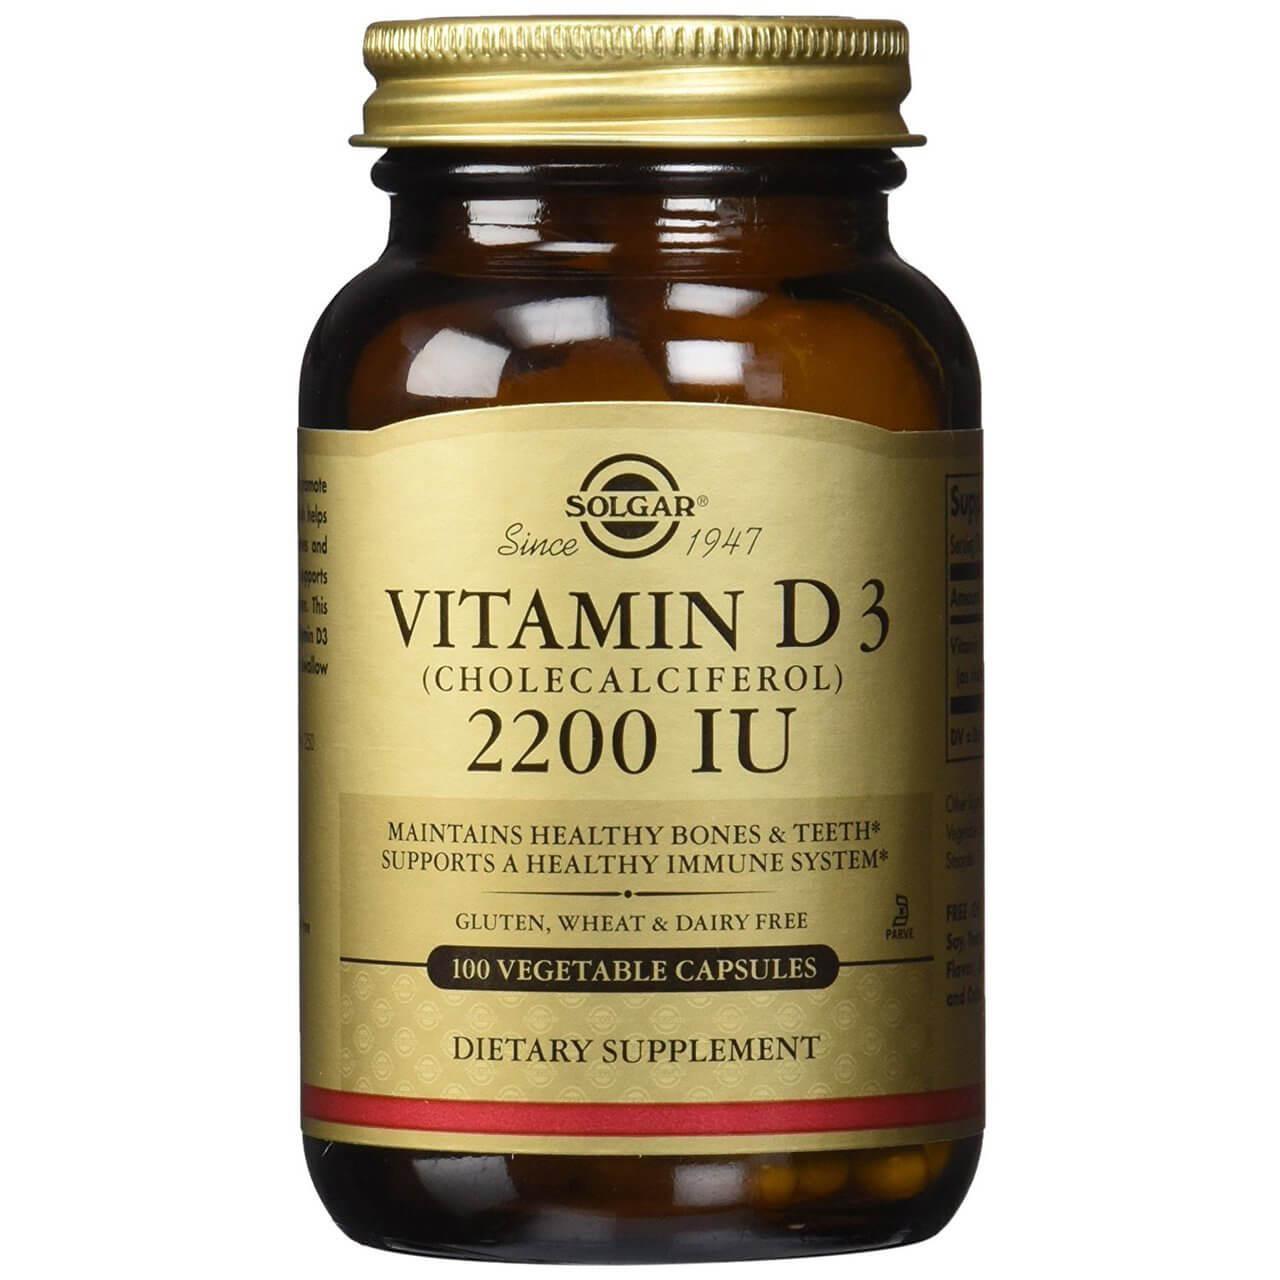 Solgar Vitamin D3 Συμπλήρωμα Διατροφής για την ΟμαλήΑπορρόφηση του Ασβεστίου απο τον Οργανισμό&την Ενίσχυση του Ανοσ/κου tabs – 2200 iu 100 caps